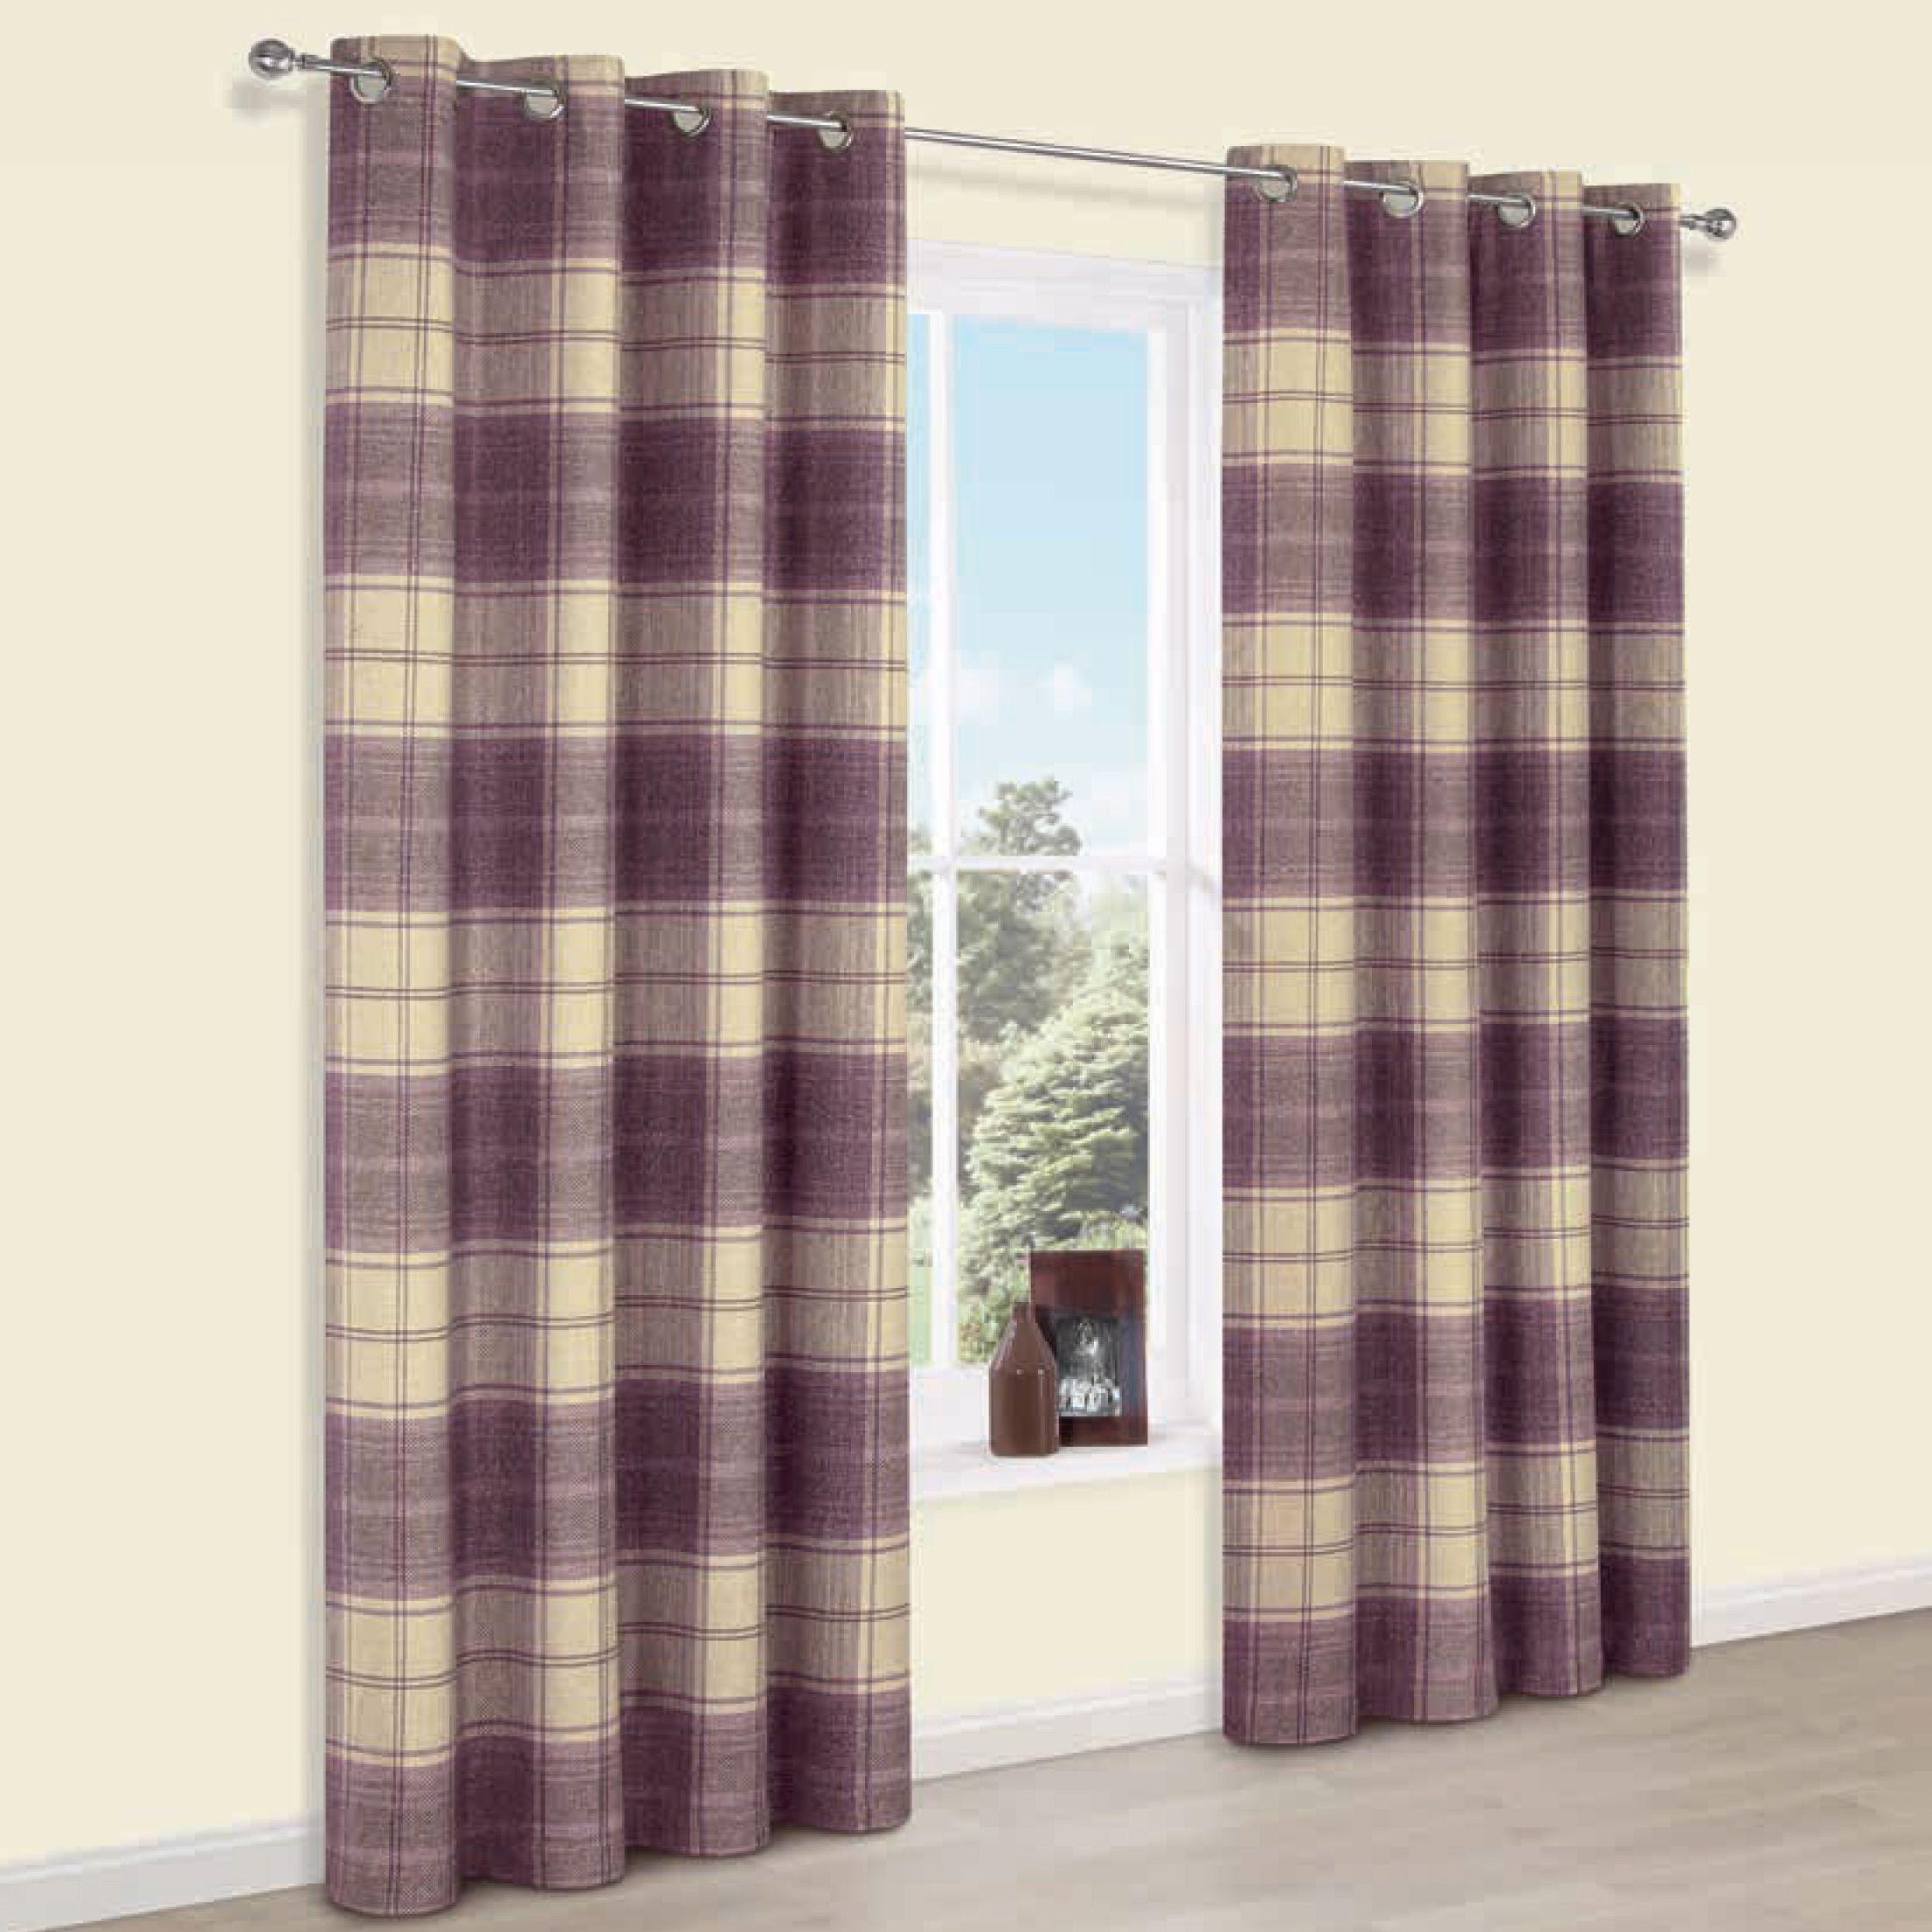 Esmeralda Purple Check Thermal Eyelet Lined Curtains W167 Cm L183